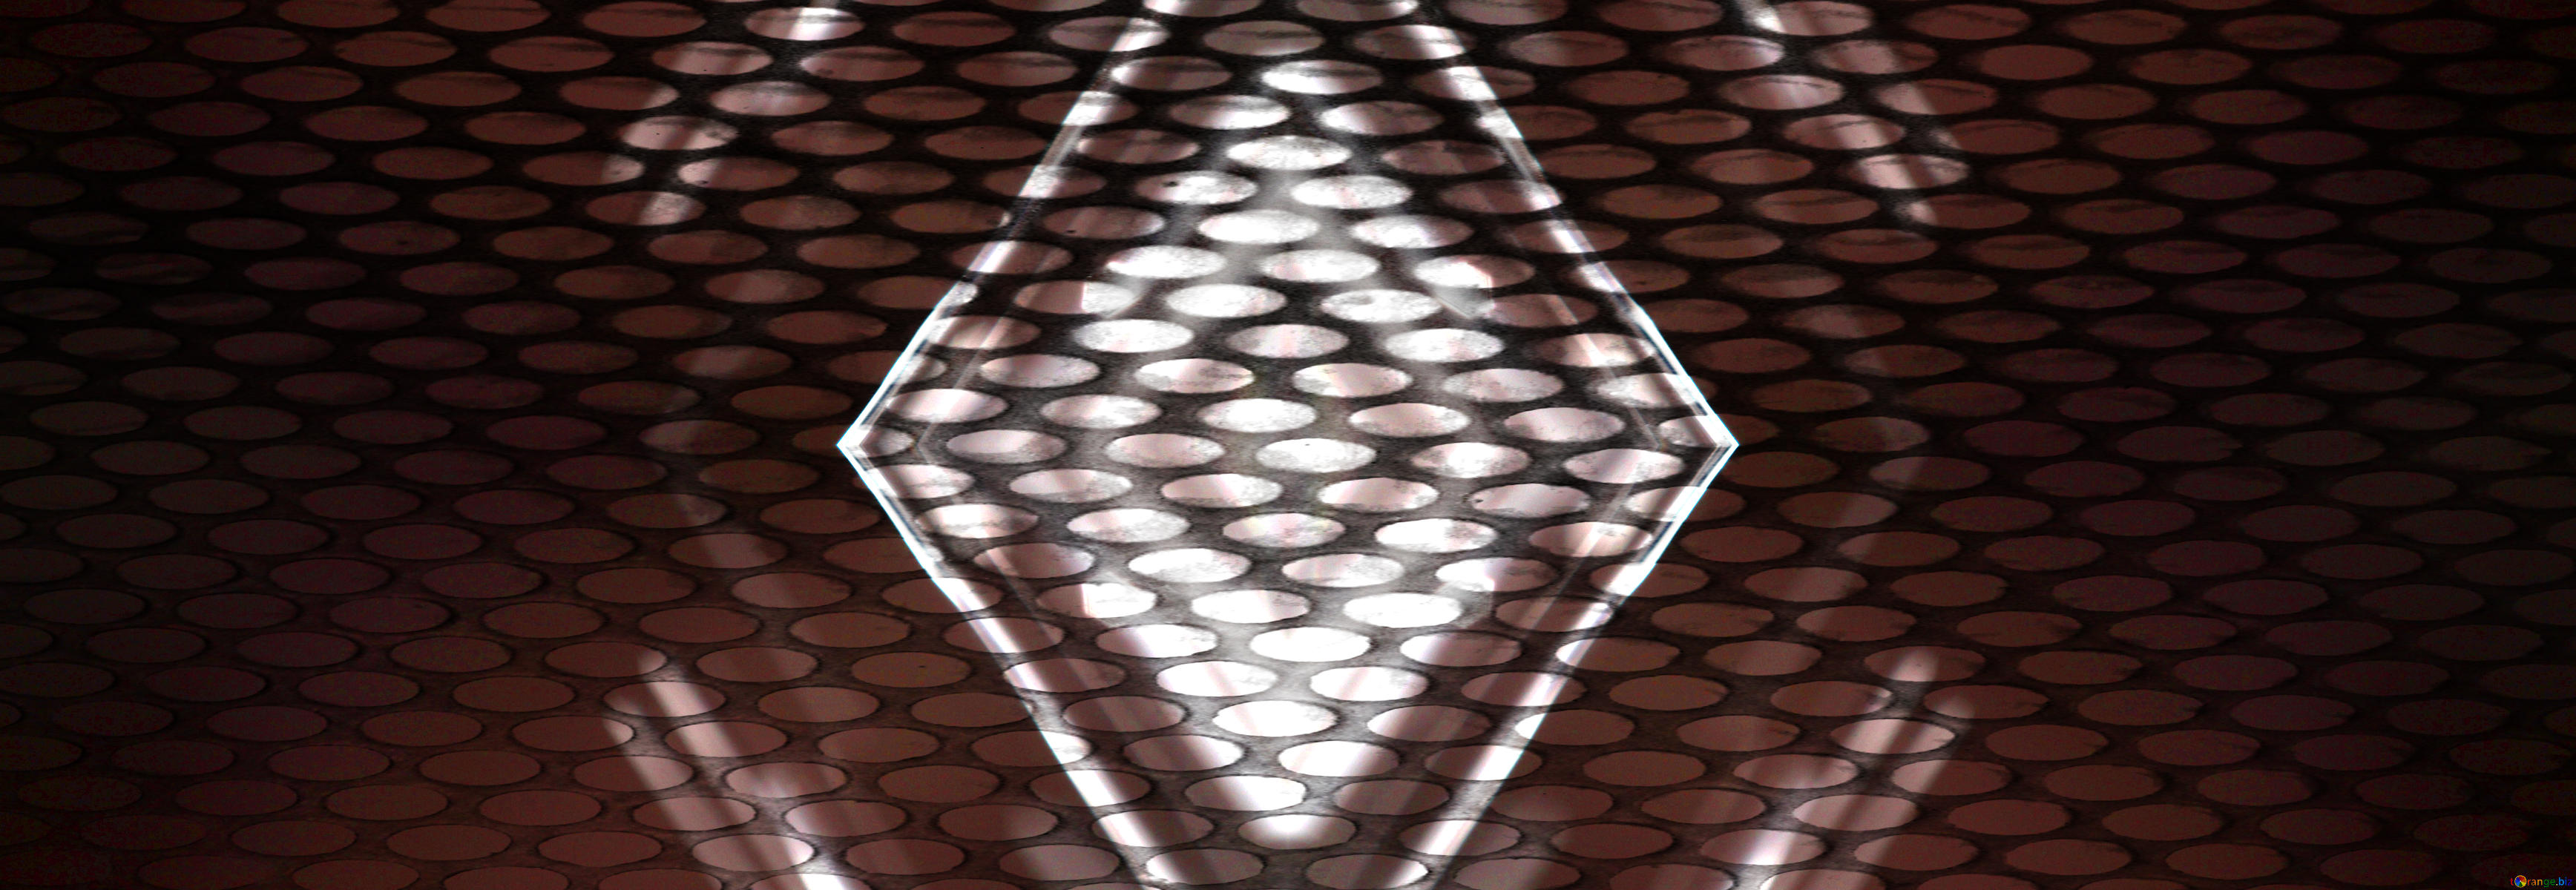 Download picture Dark pattern background Frame Template Steel 3472x1200